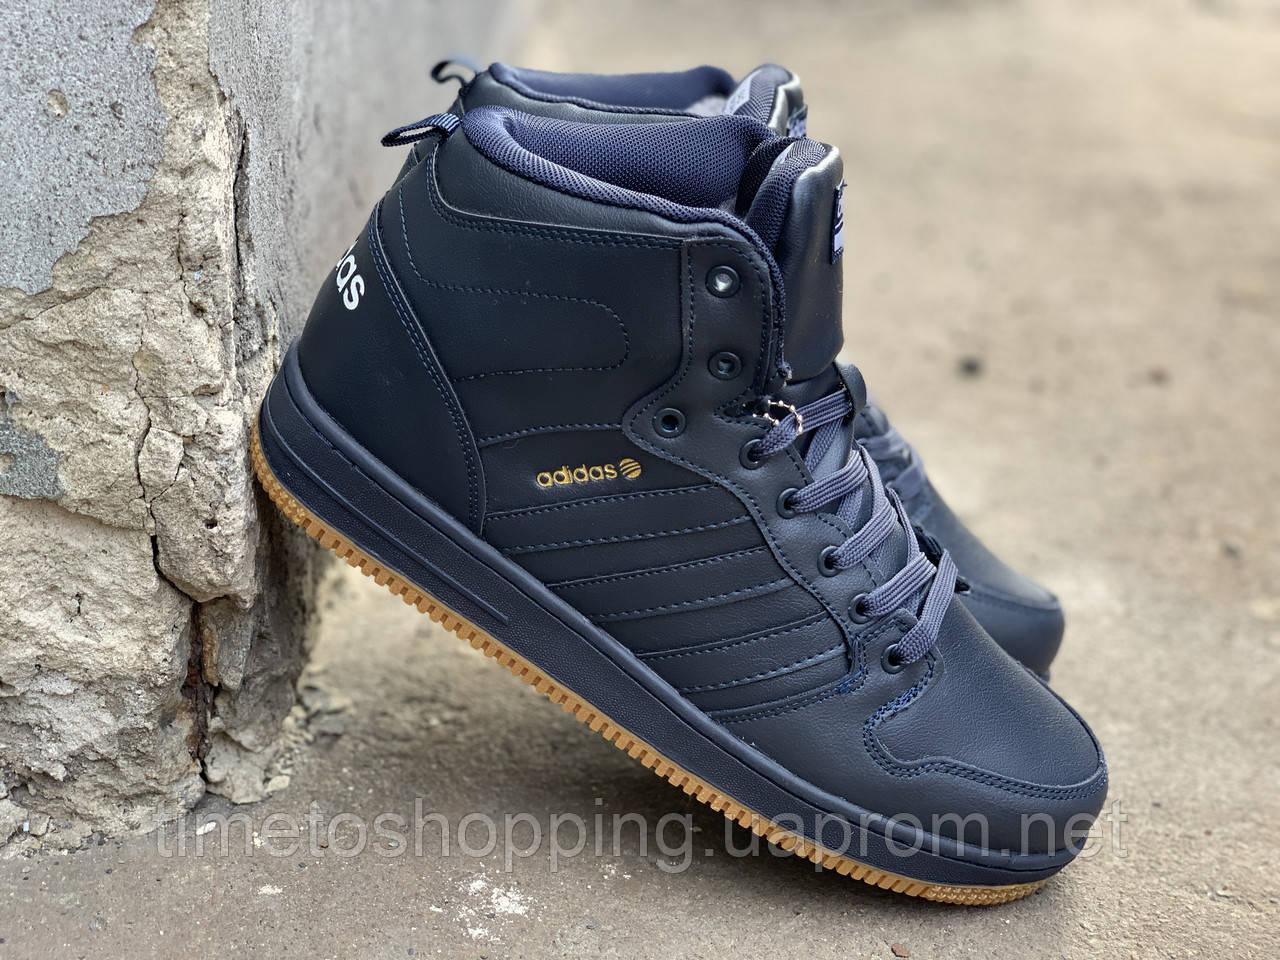 Зимние ботинки (на меху) мужские Adidas Cloudfoam  3-046 ⏩РАЗМЕР  [ 44,45 ]